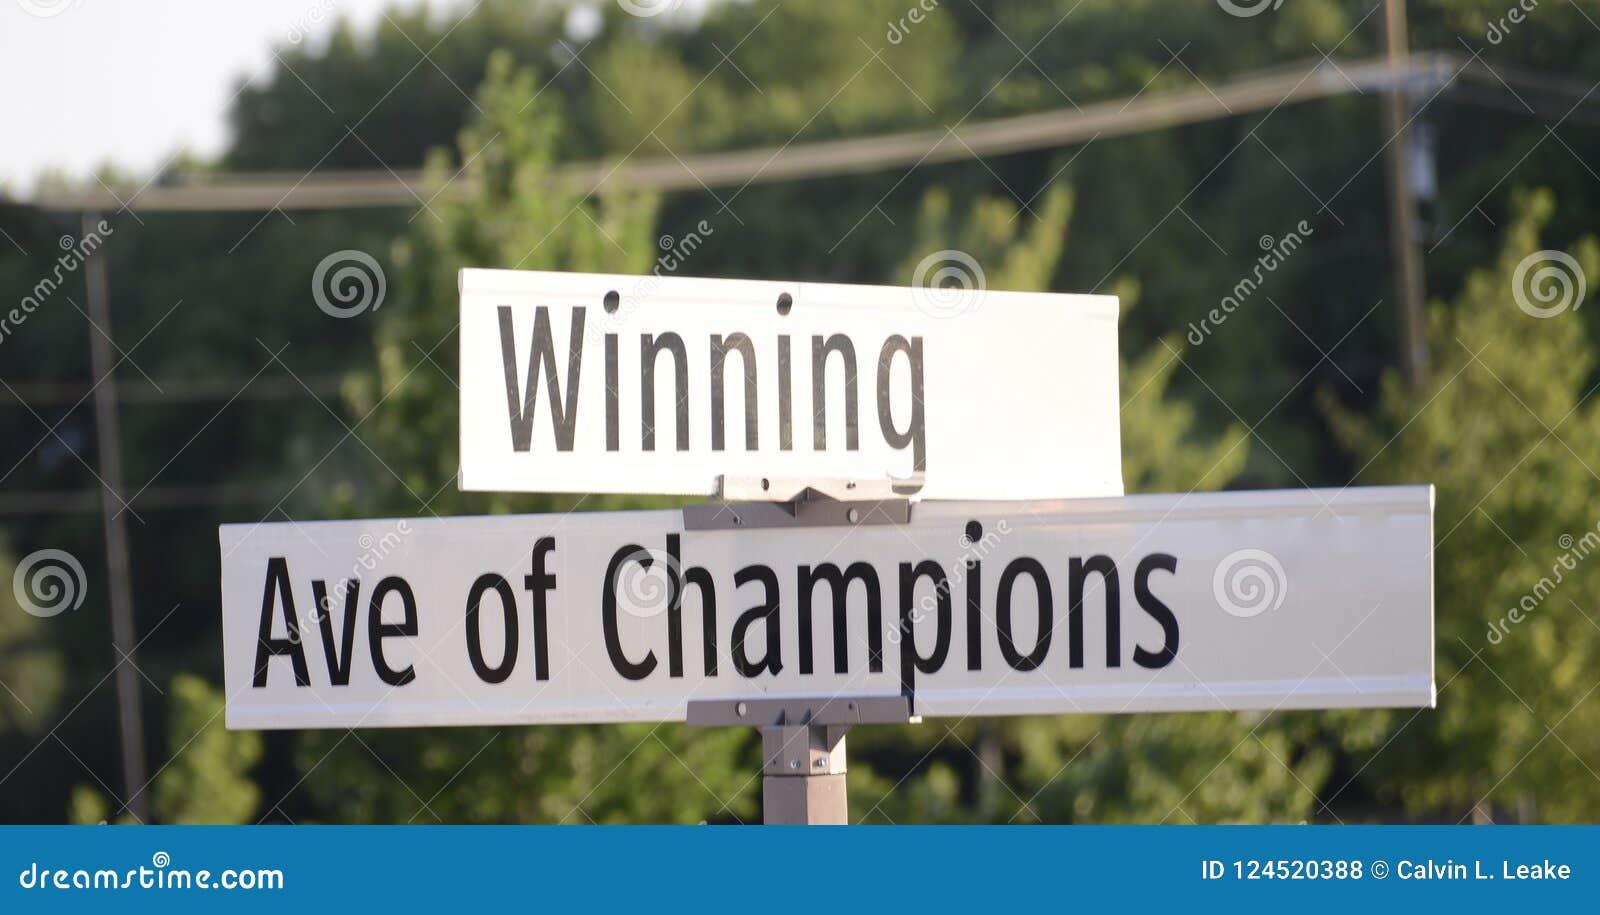 Winning Avenue of Champions